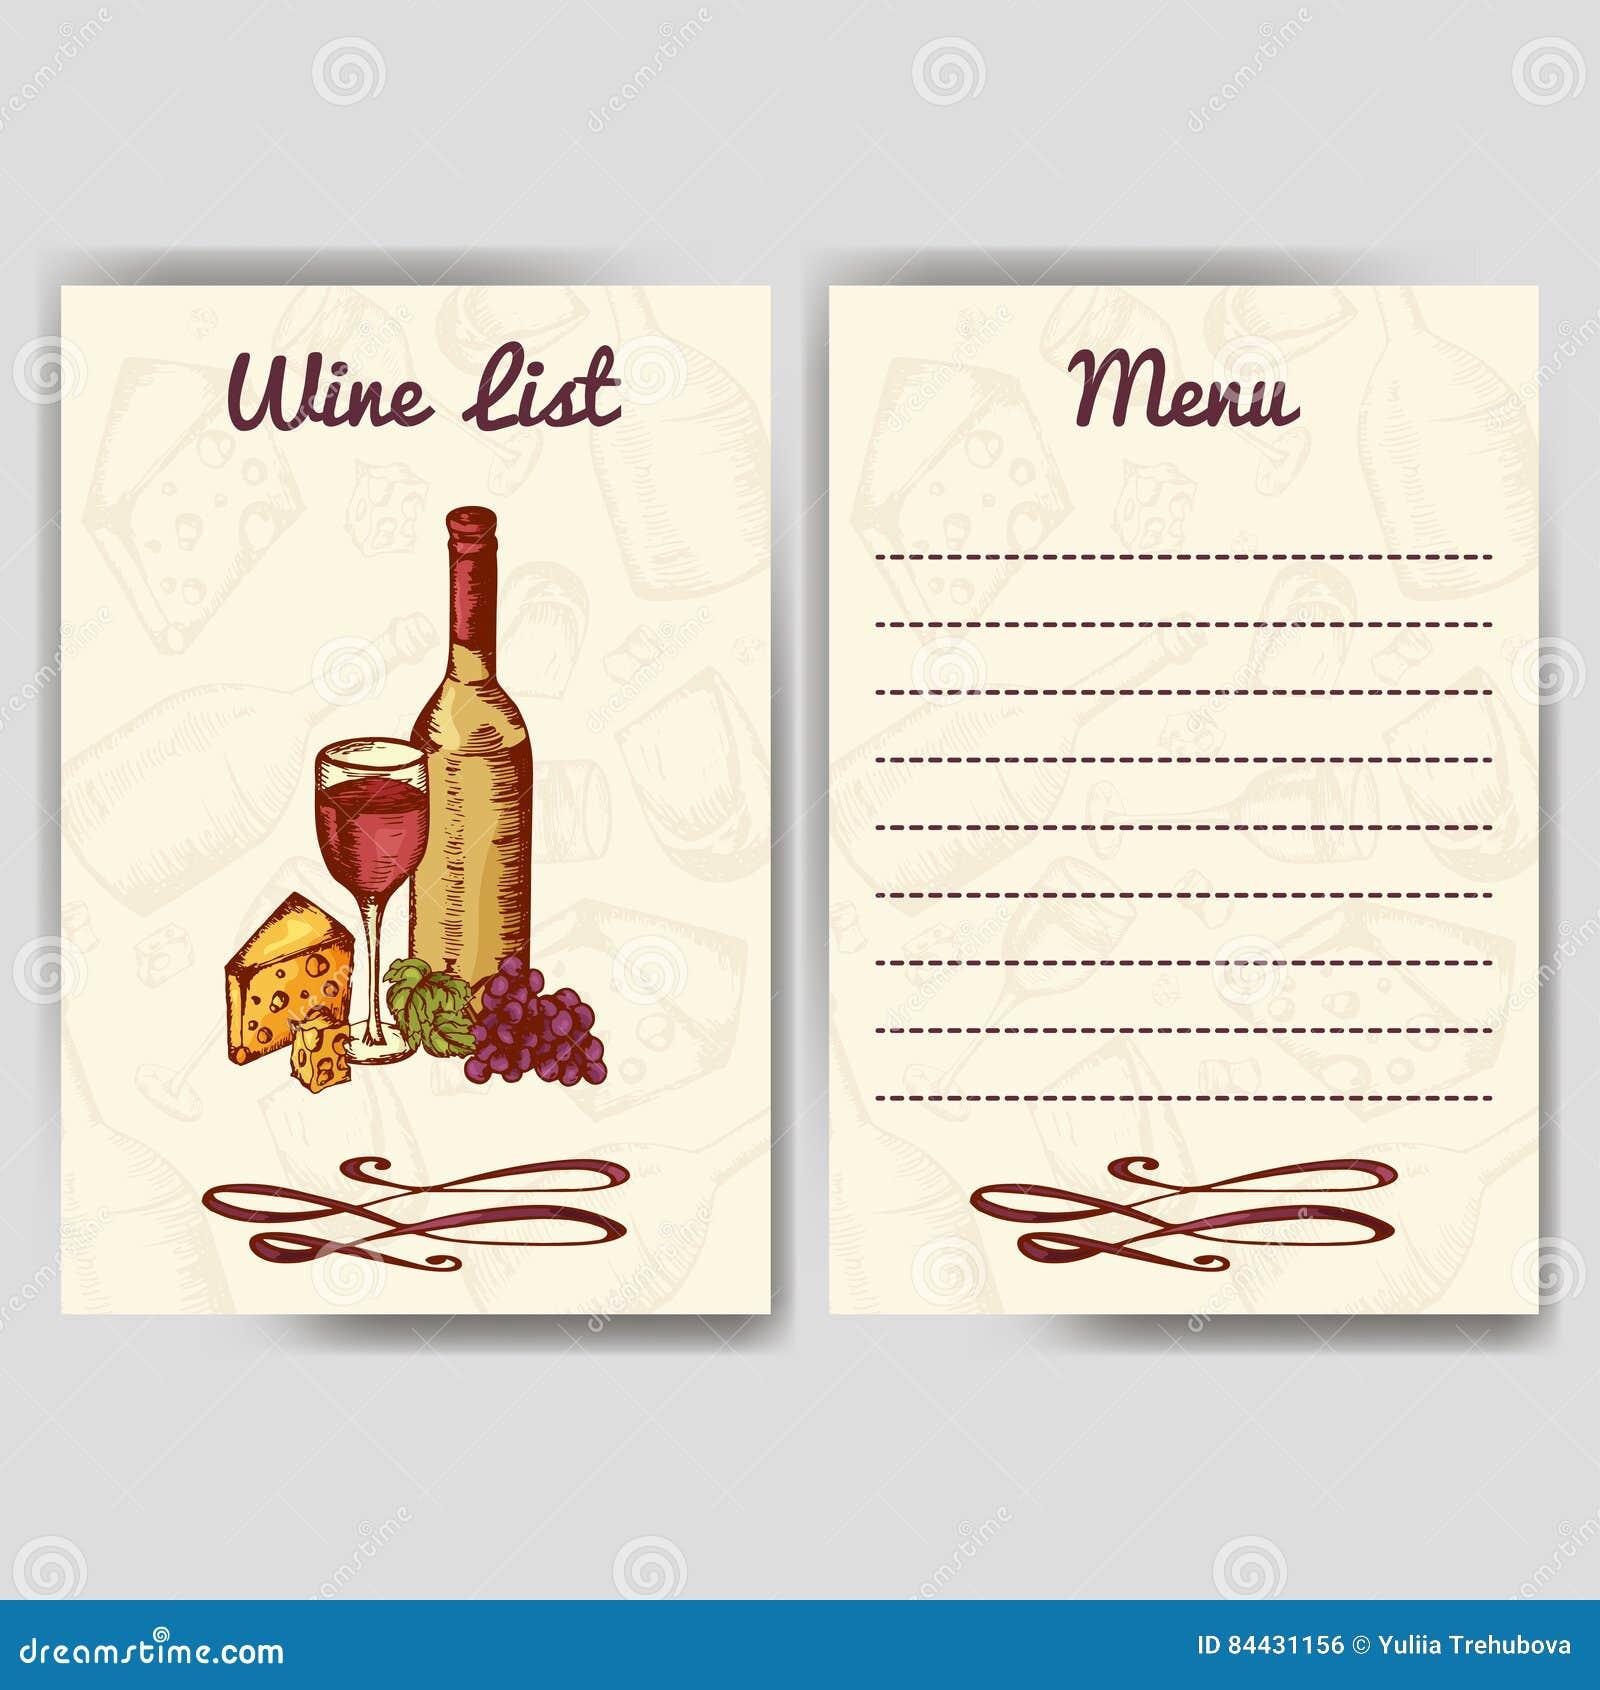 Design for wine list restaurant template for invitation for Menu reception amis